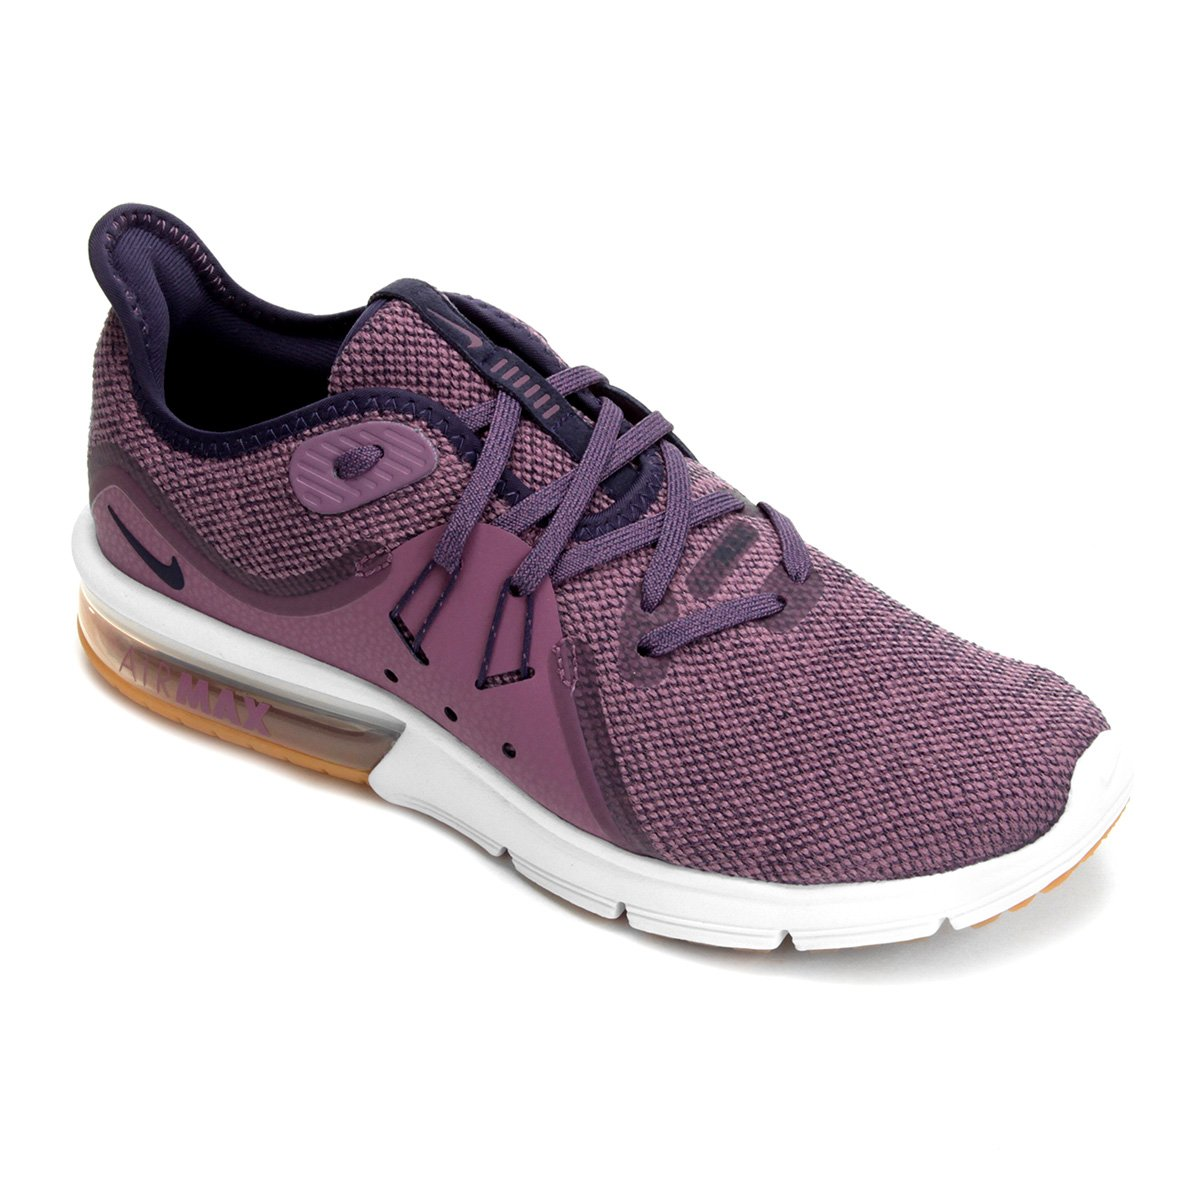 fe83d44aad3e0 Tênis Nike Air Max Fury Sequent 3 Feminino - Violeta - Compre Agora ...